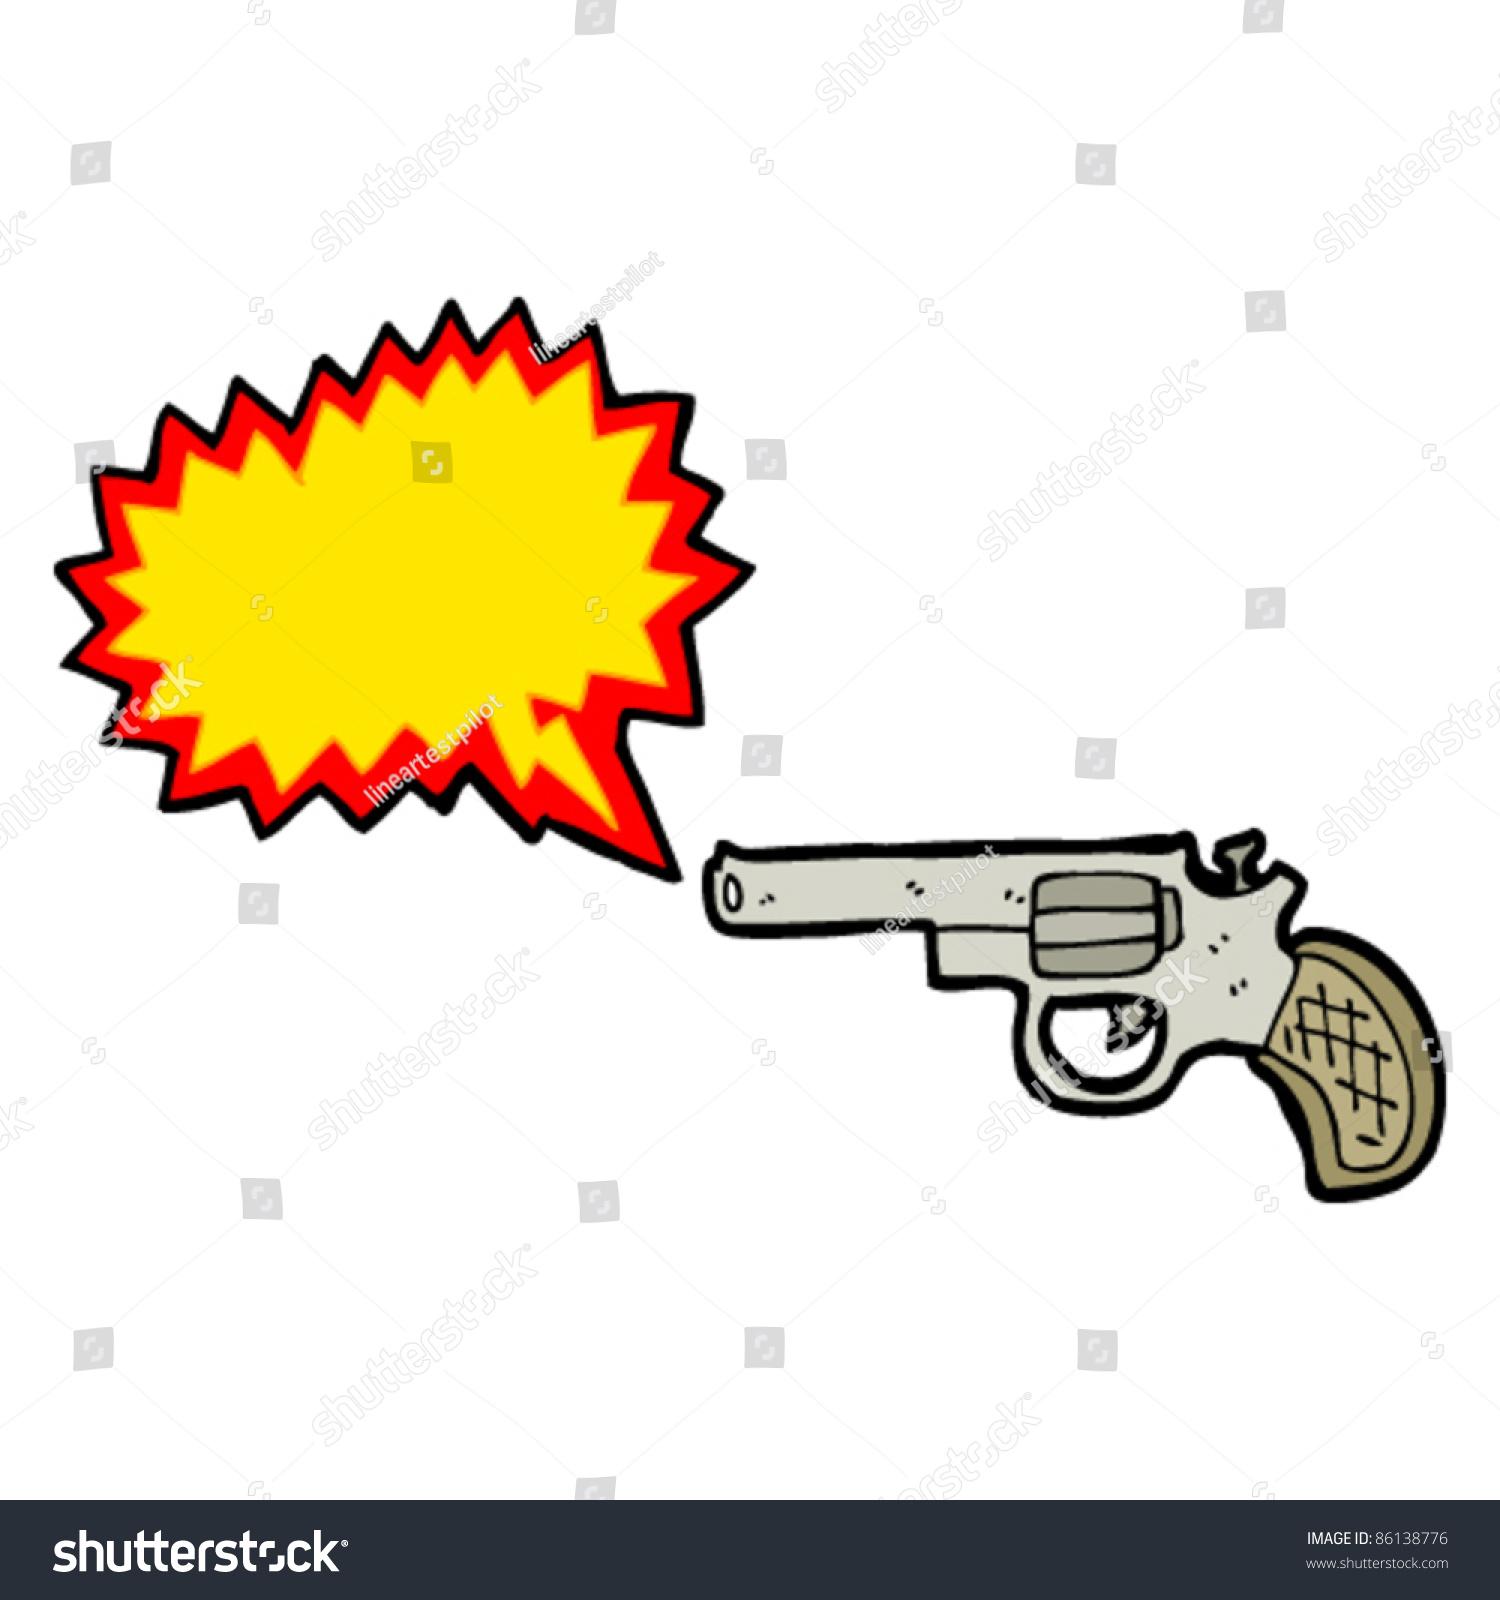 Cartoon gun blank bang symbol stock vector 86138776 shutterstock cartoon gun with blank bang symbol biocorpaavc